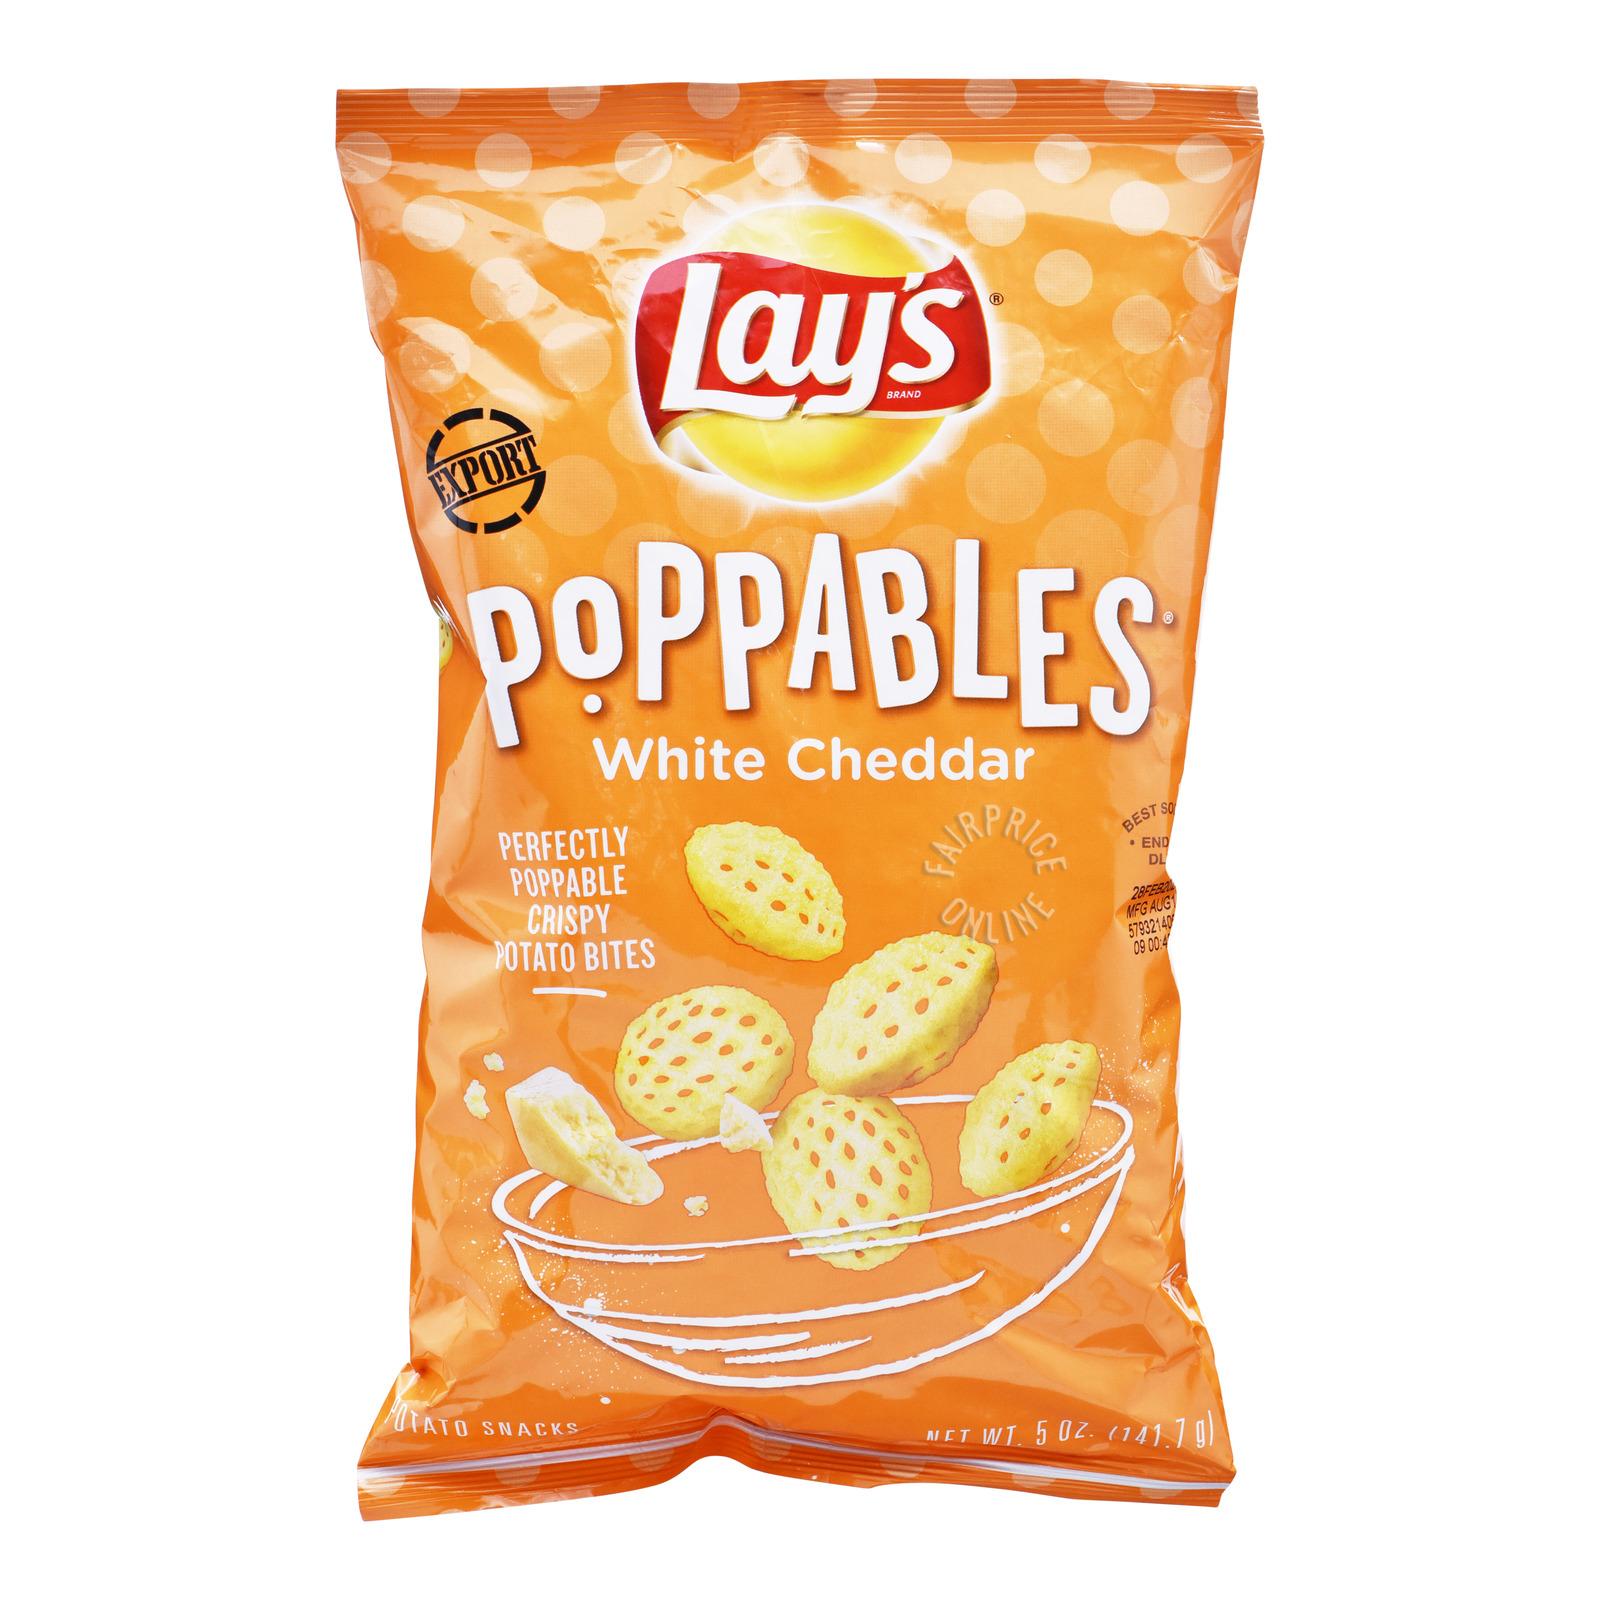 Lay's Poppables Potato Bites - White Cheddar